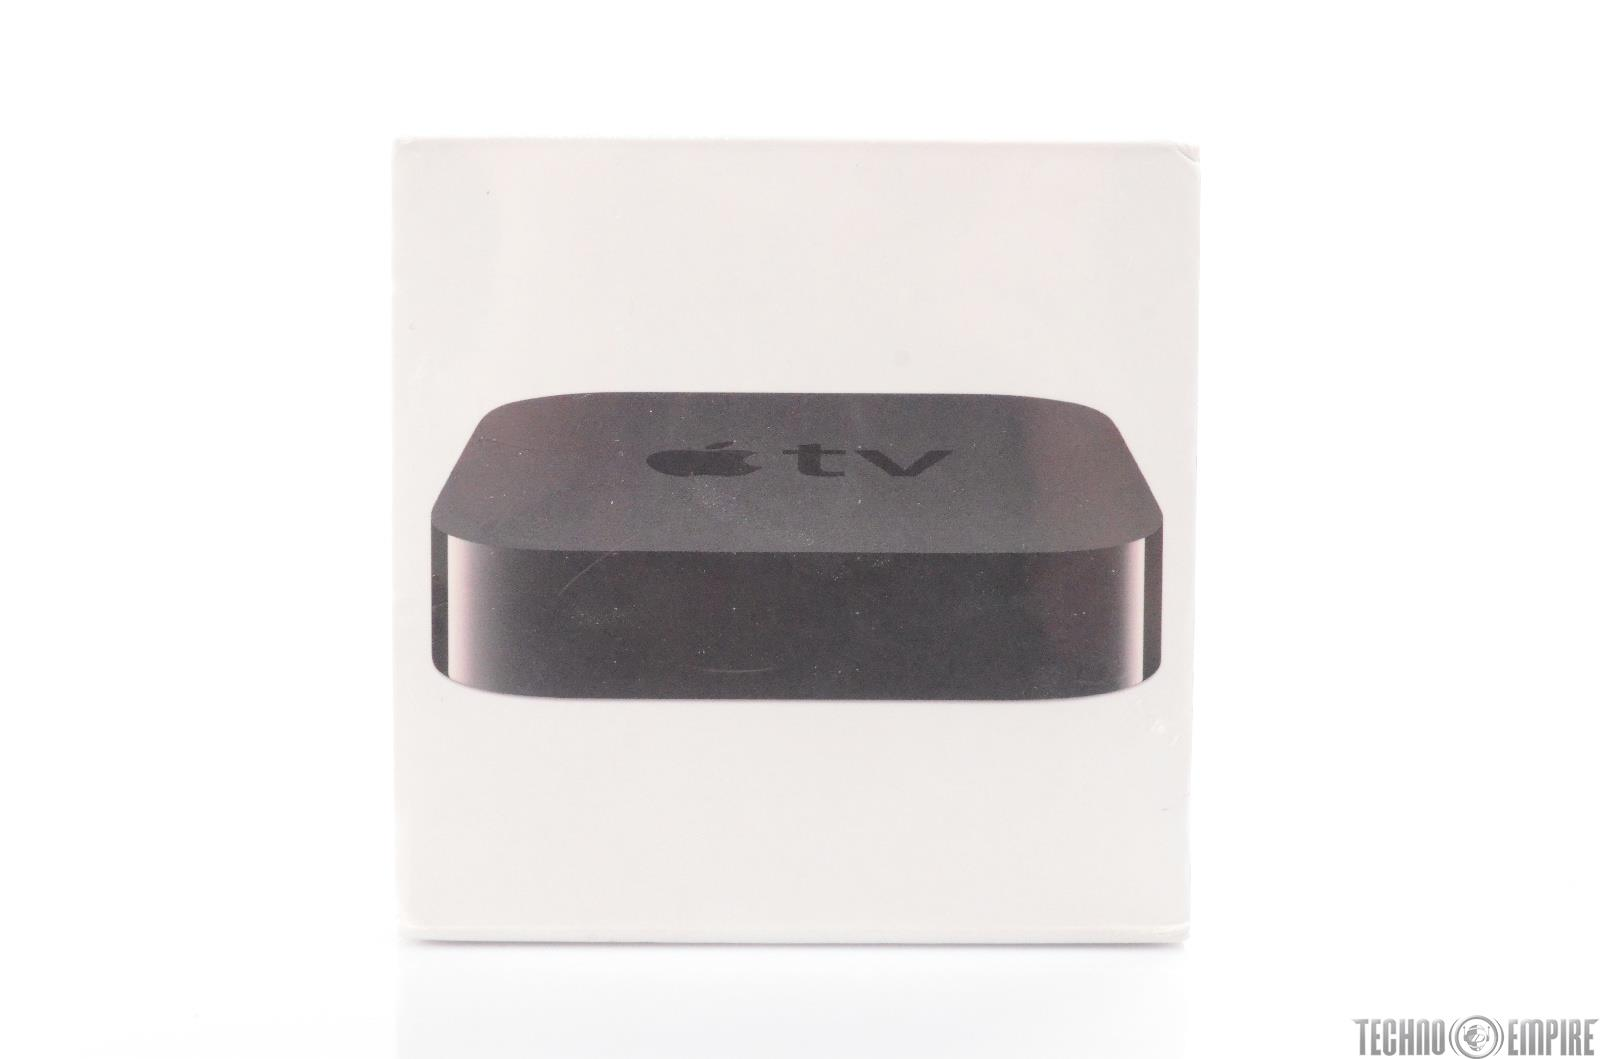 Apple TV 3rd Generation Digital Media Player & Microconsole SEALED NEW #30271